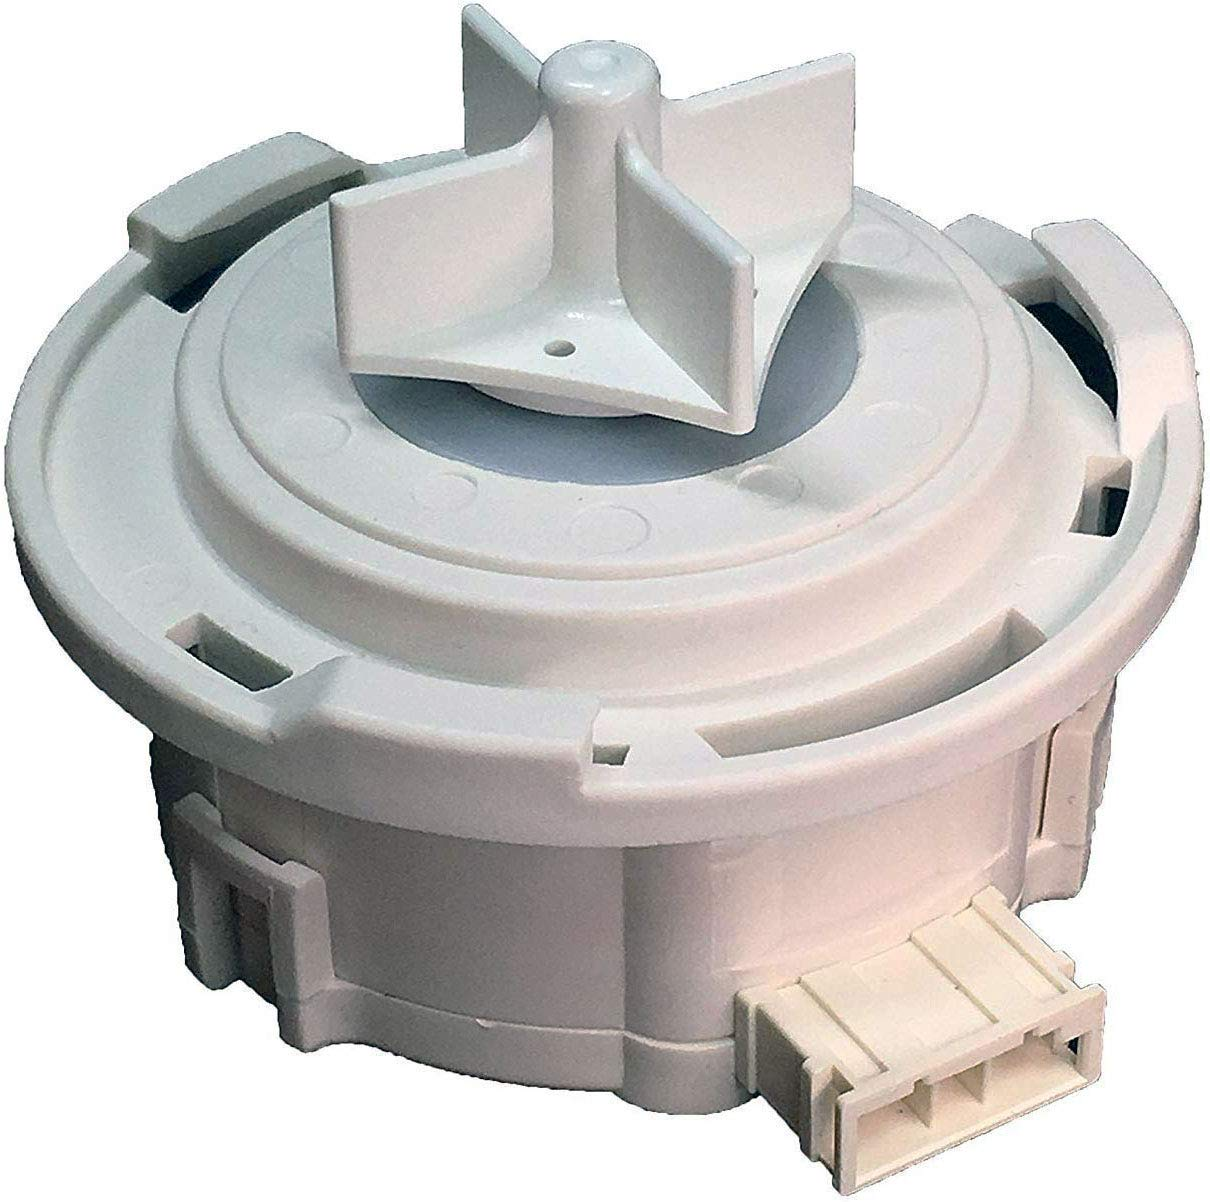 EAU60710801 BLDC Dishwasher Pump Motor Replacement DC 22V